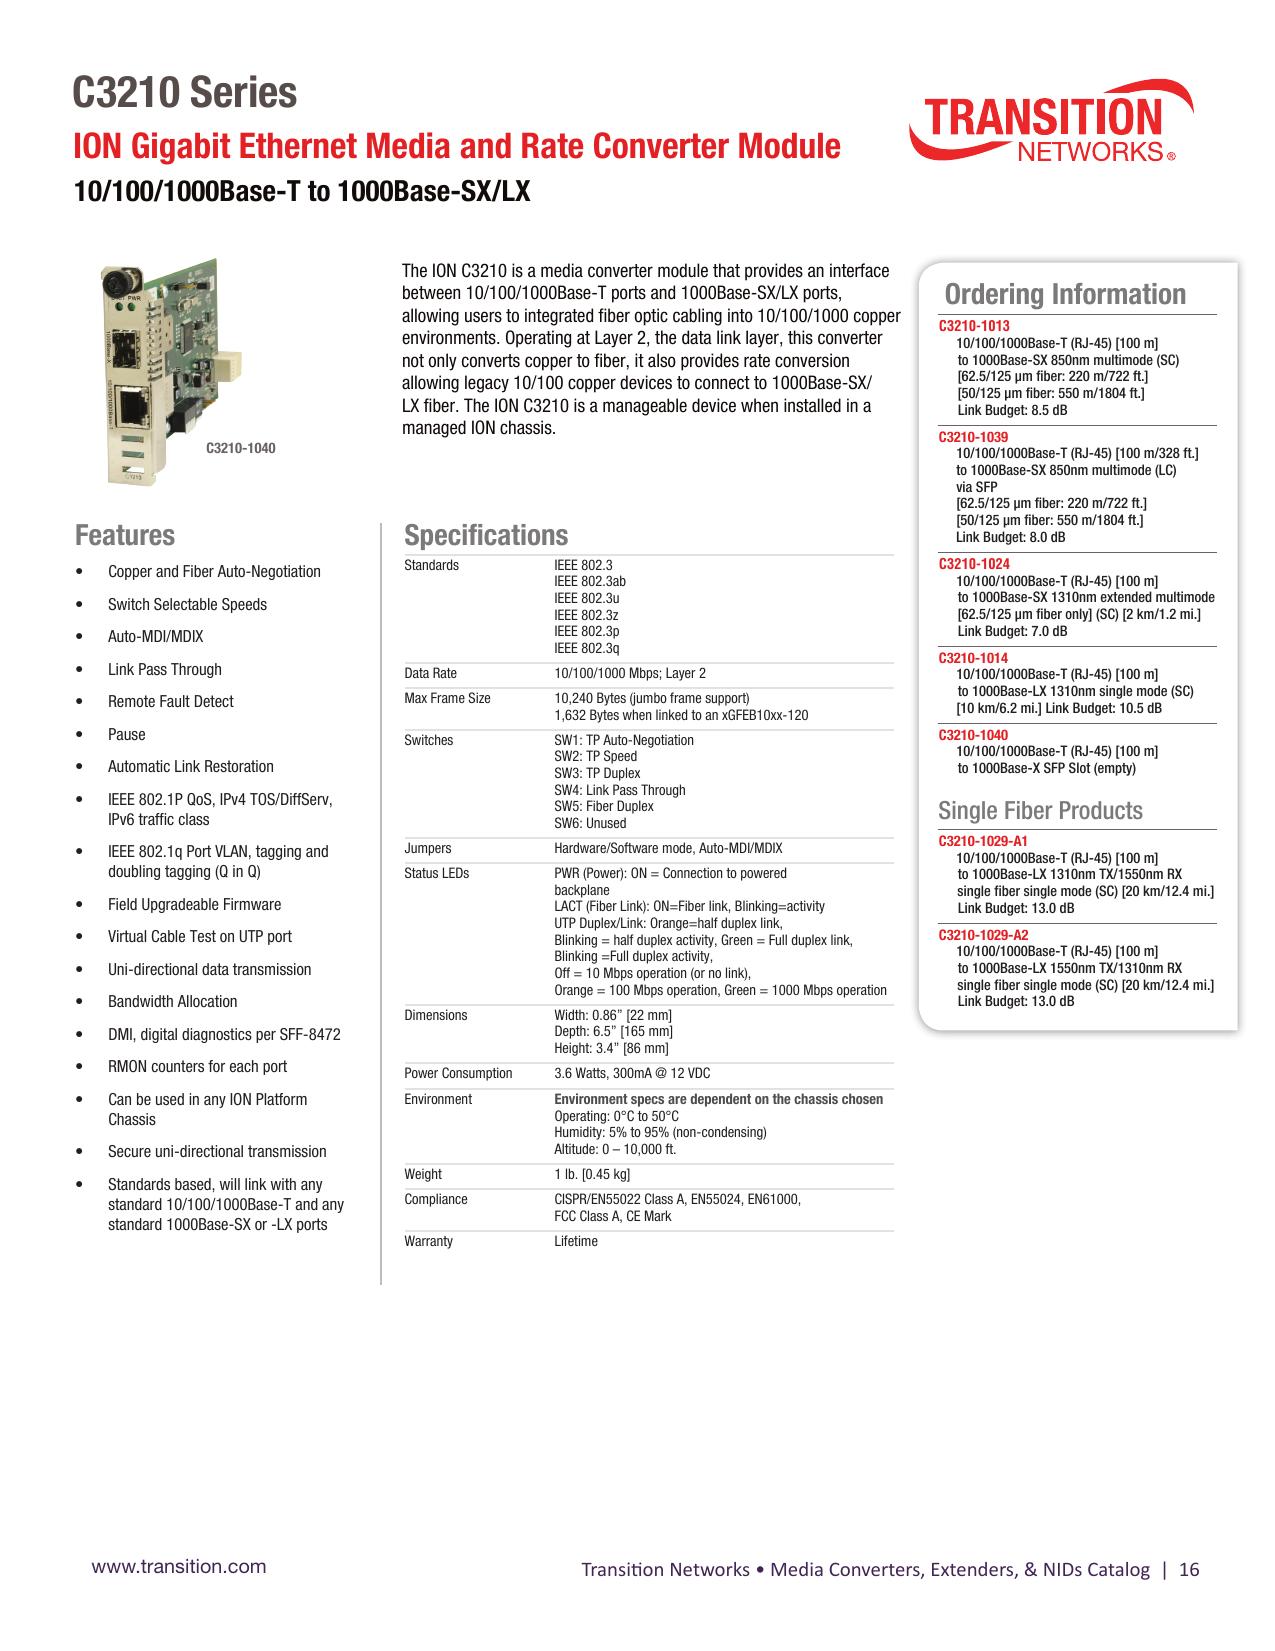 C3210 Series - Transition Networks | manualzz com